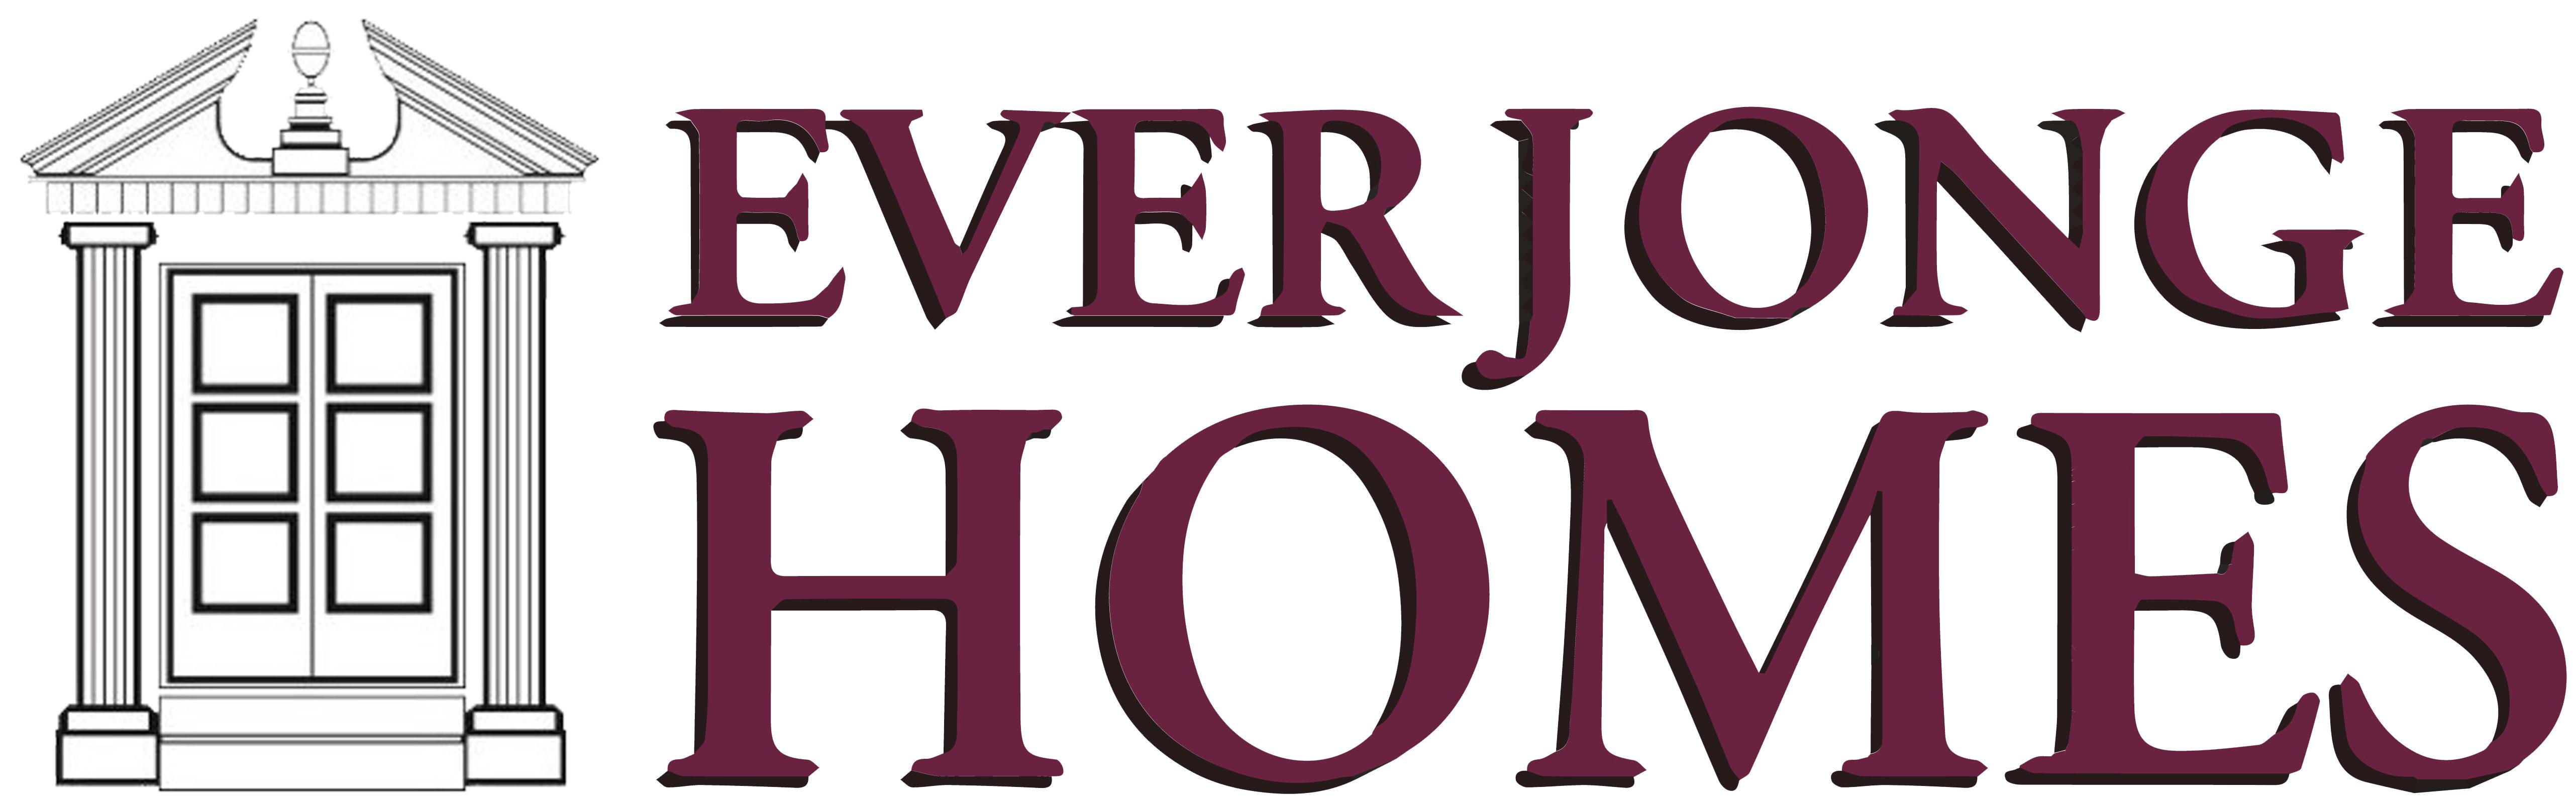 Everjonge Homes